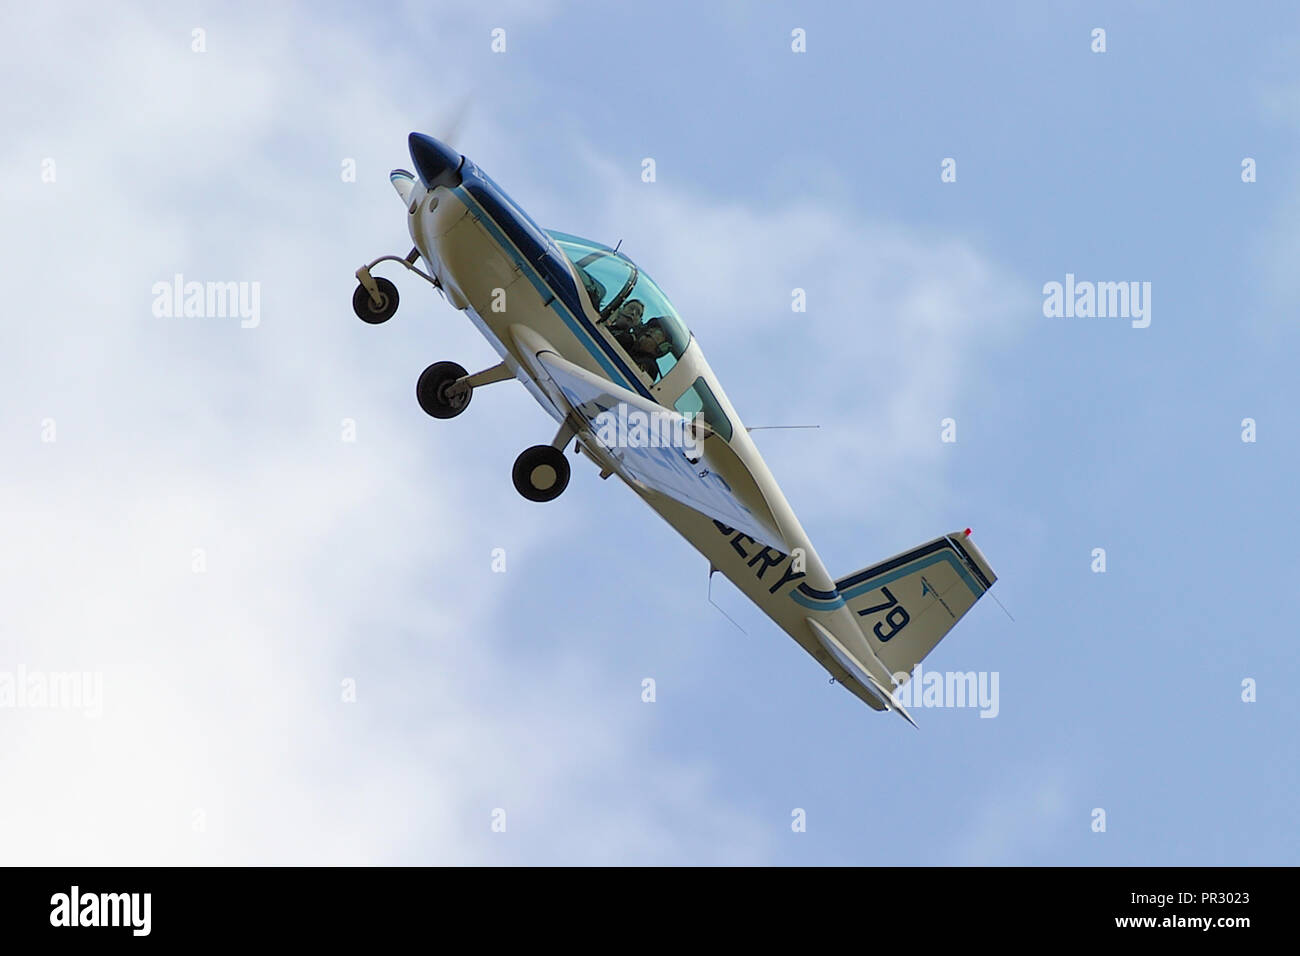 Grumman AA-1B G-BERY 'Race 79' taking a corner in the Royal Aero Club Air Race at Sywell Aerodrome. Air racing cornering. Flying - Stock Image